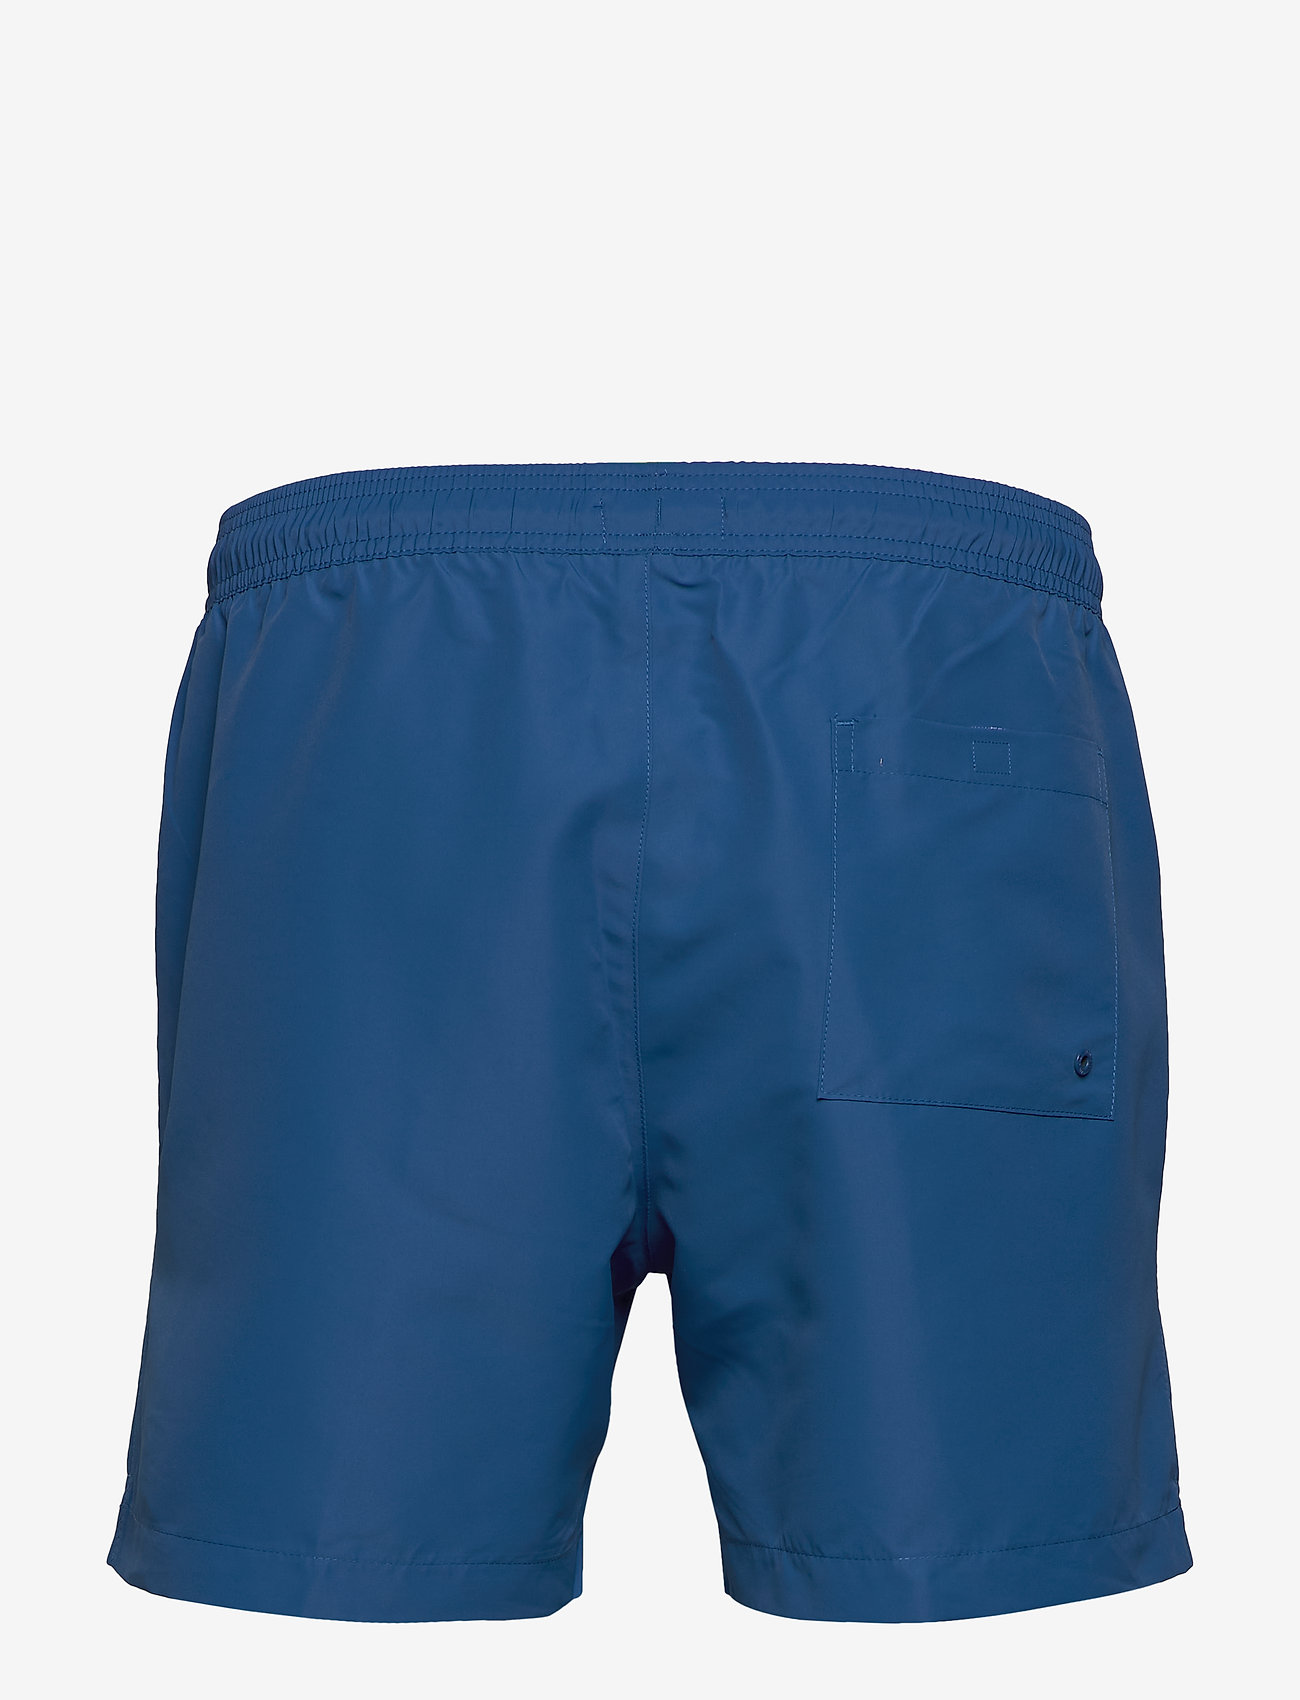 Calvin Klein - MEDIUM DRAWSTRING - badehosen - snorkel blue - 1